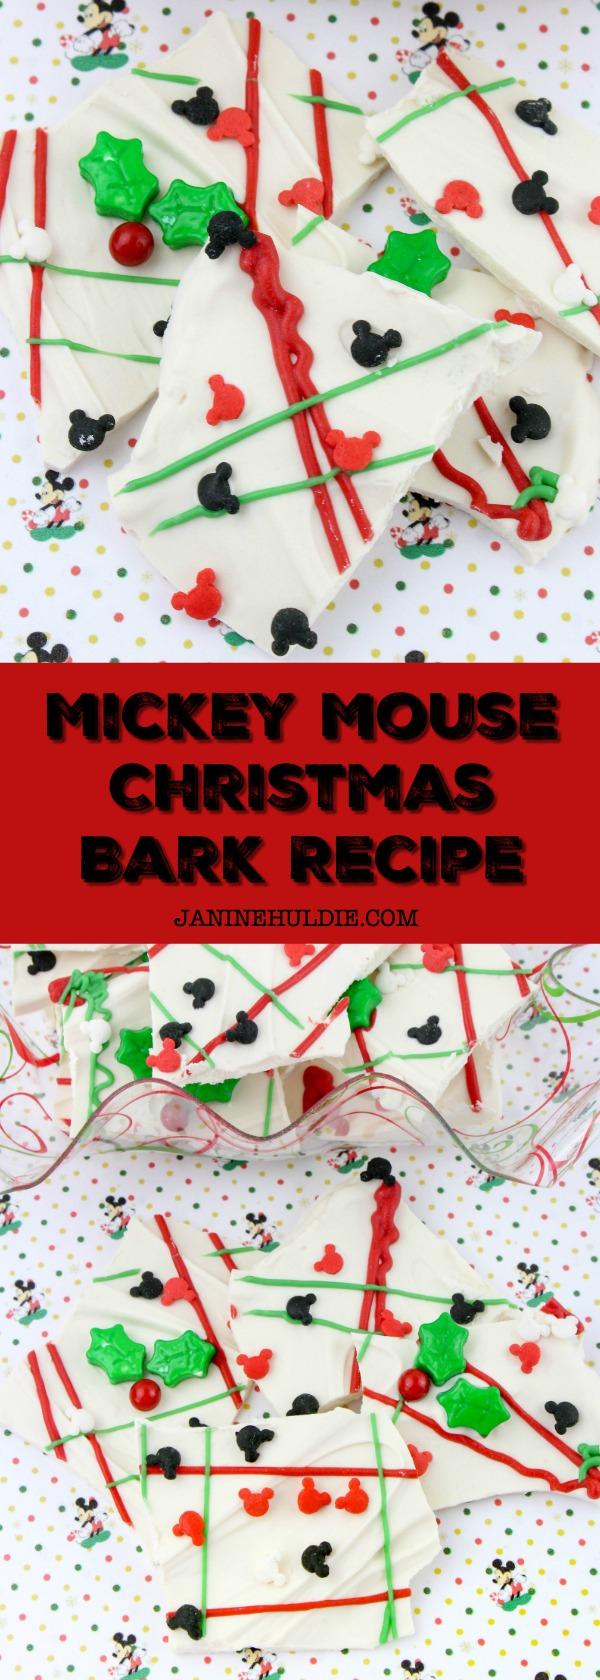 Mickey Mouse Christmas Bark Recipe